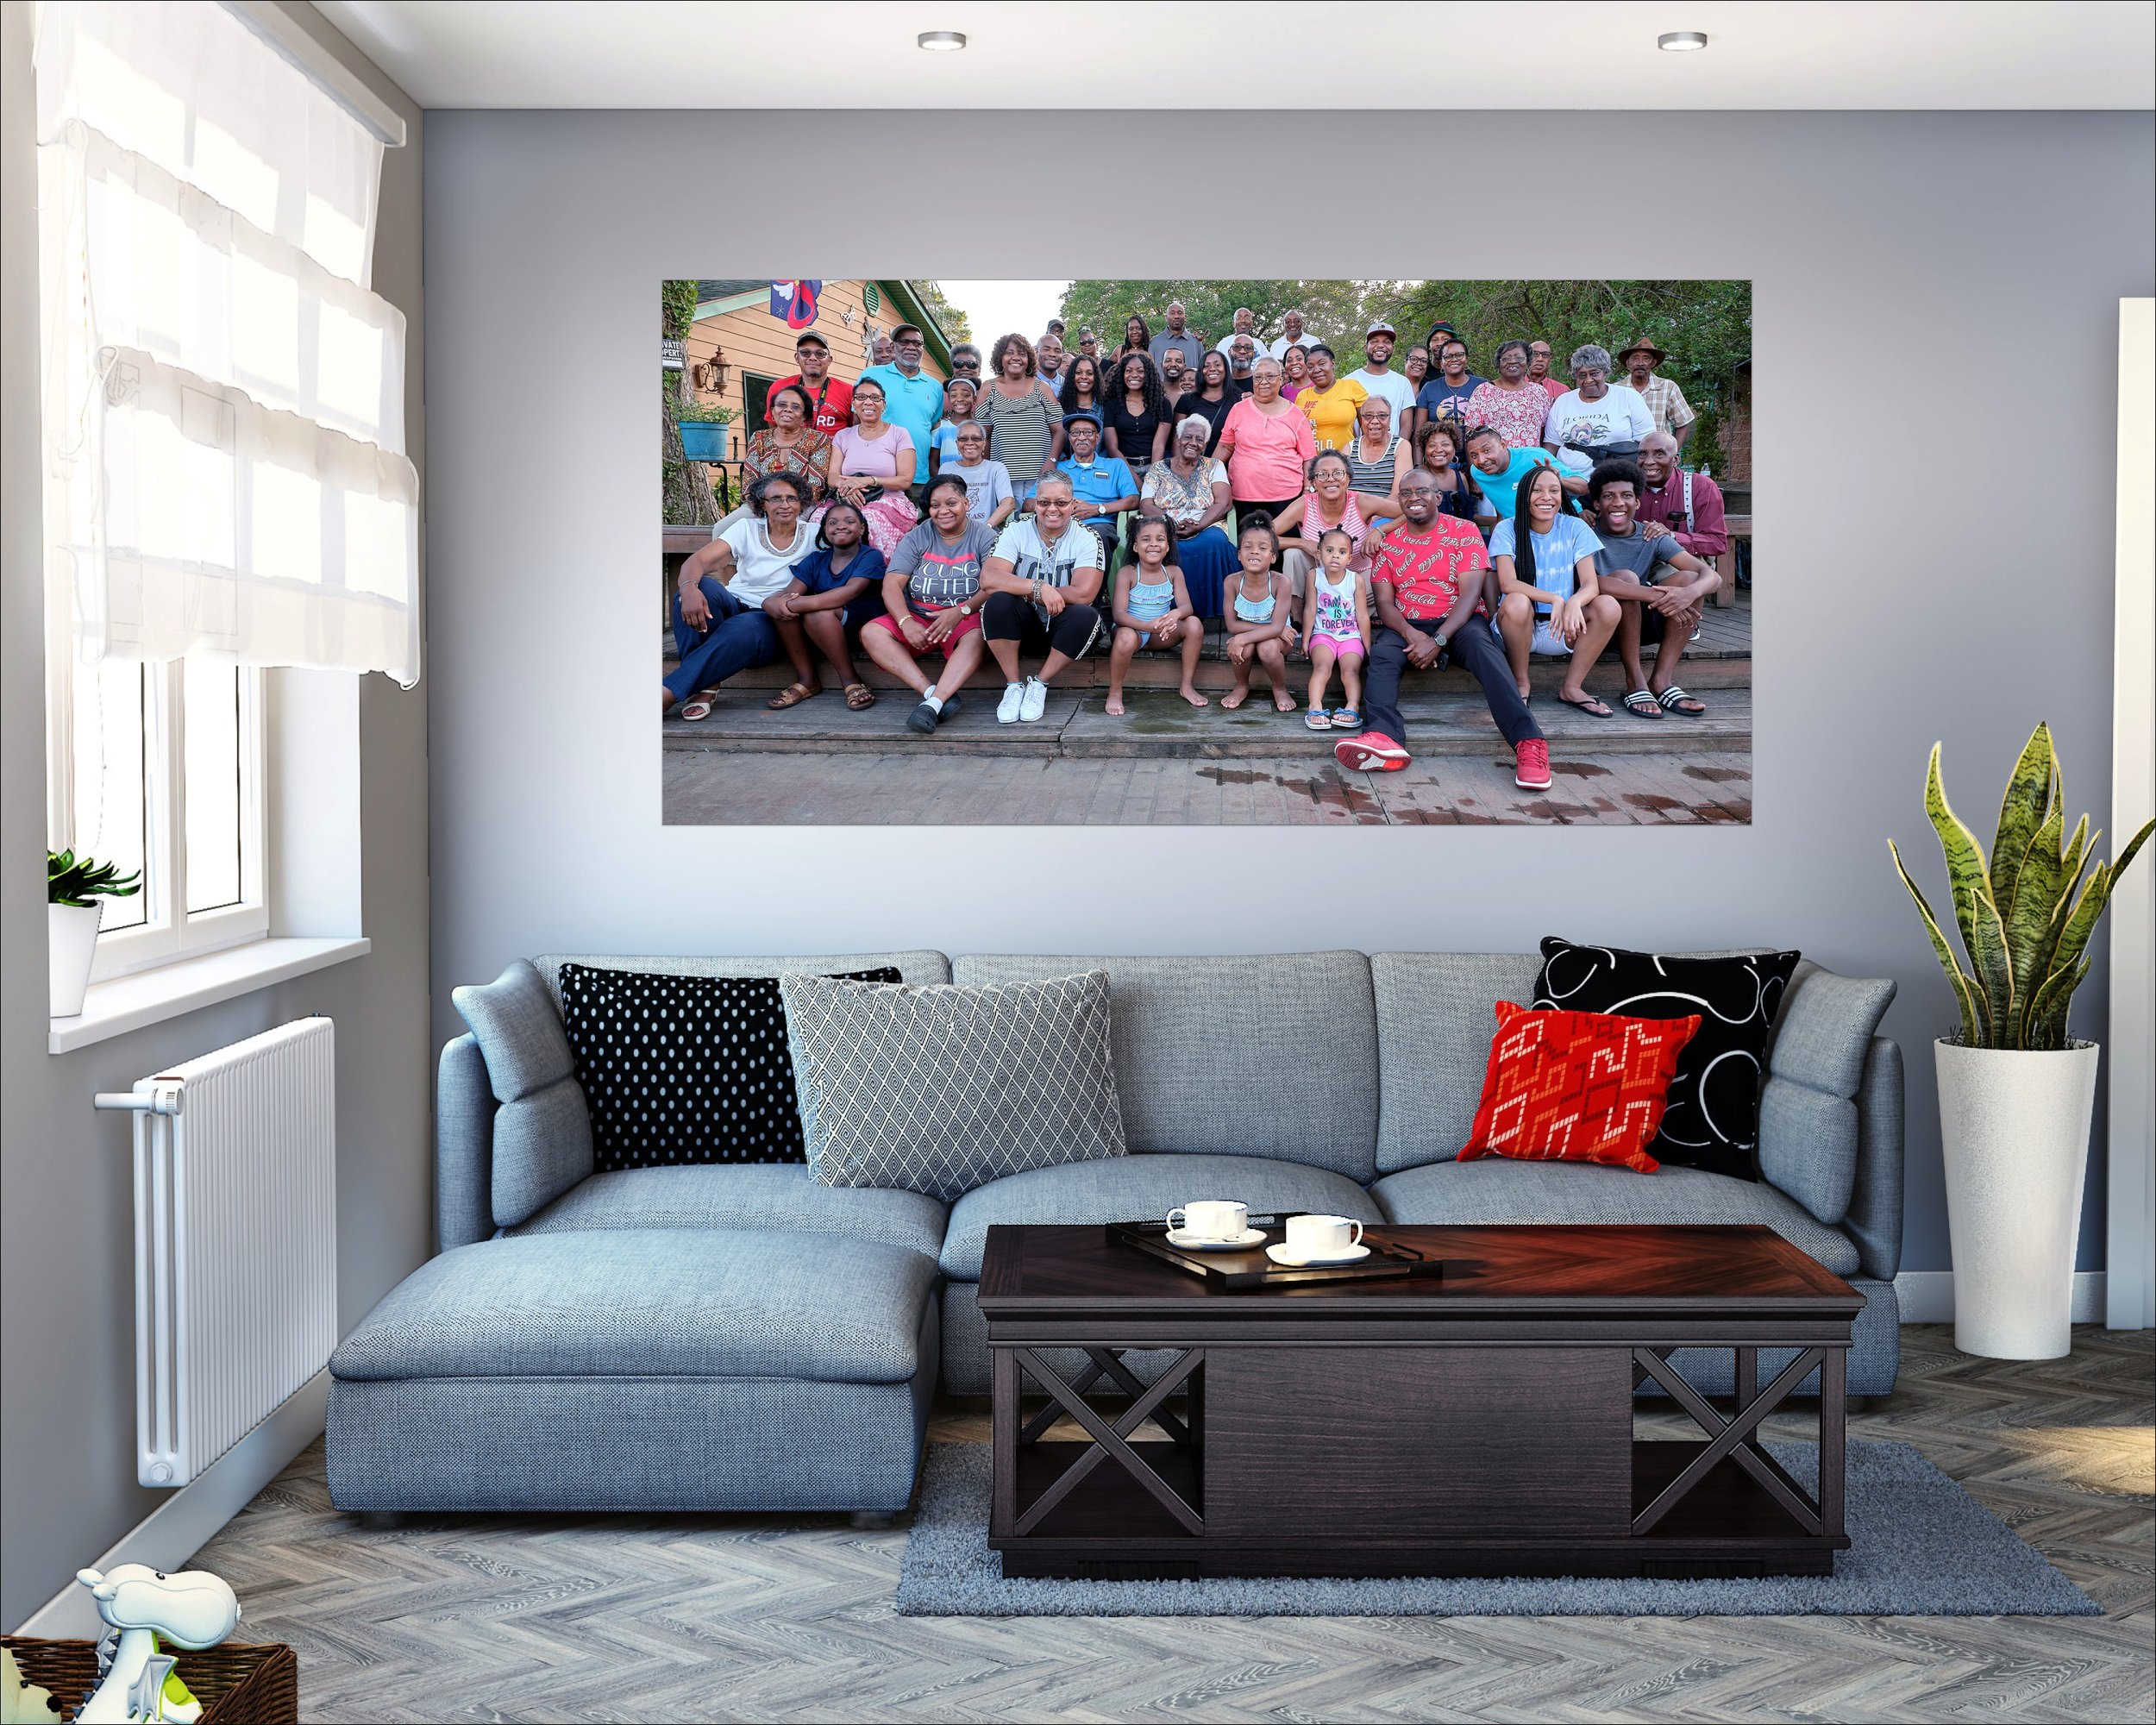 candid_photography_family_photo_ideas.jpg